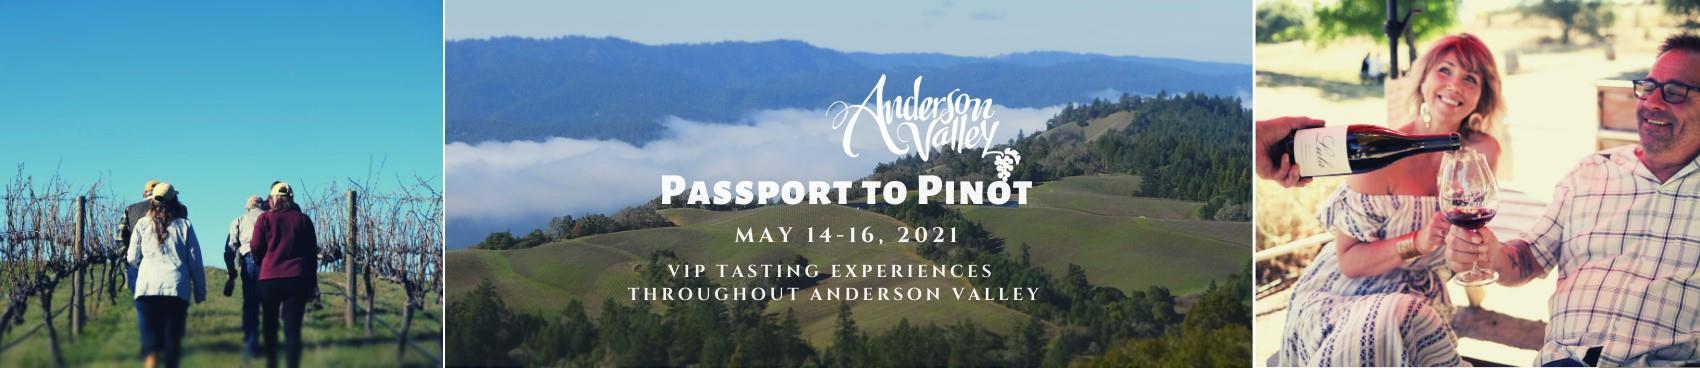 Anderson Valley Passport to Pinot